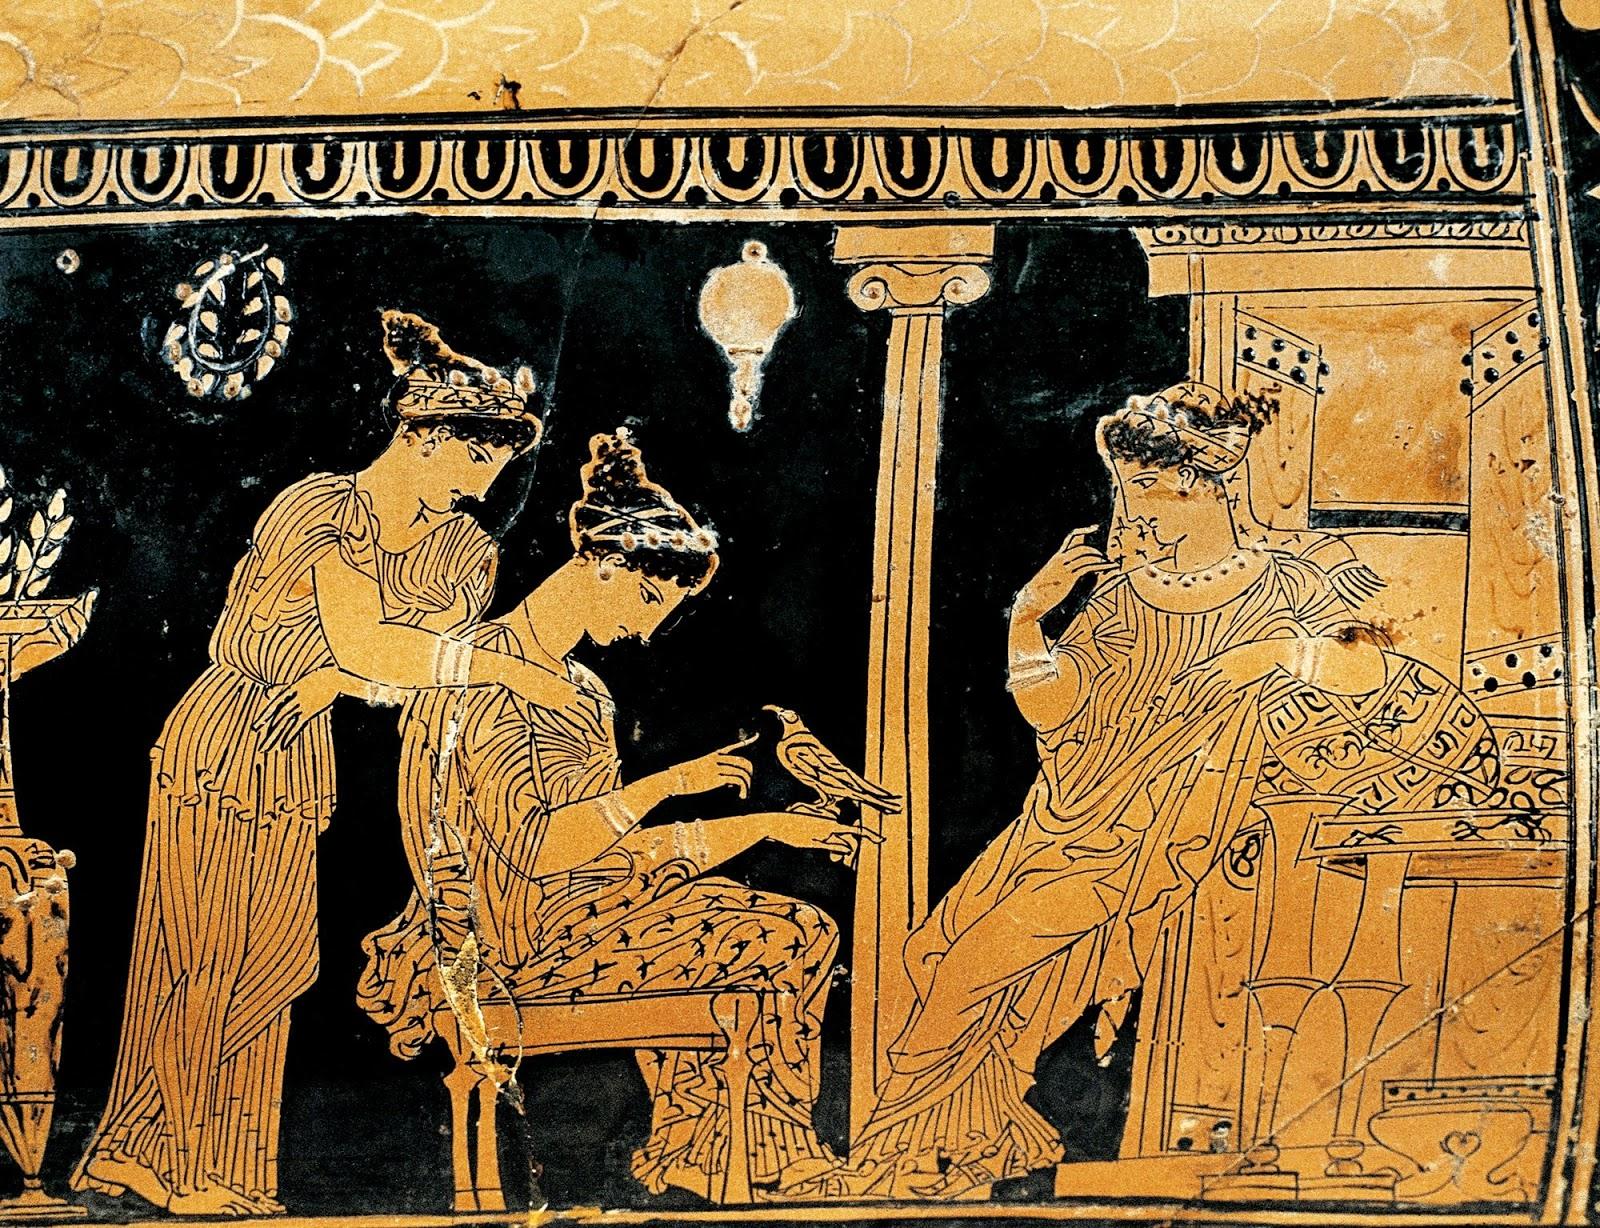 Decoracion griega clasica - Decoracion griega ...